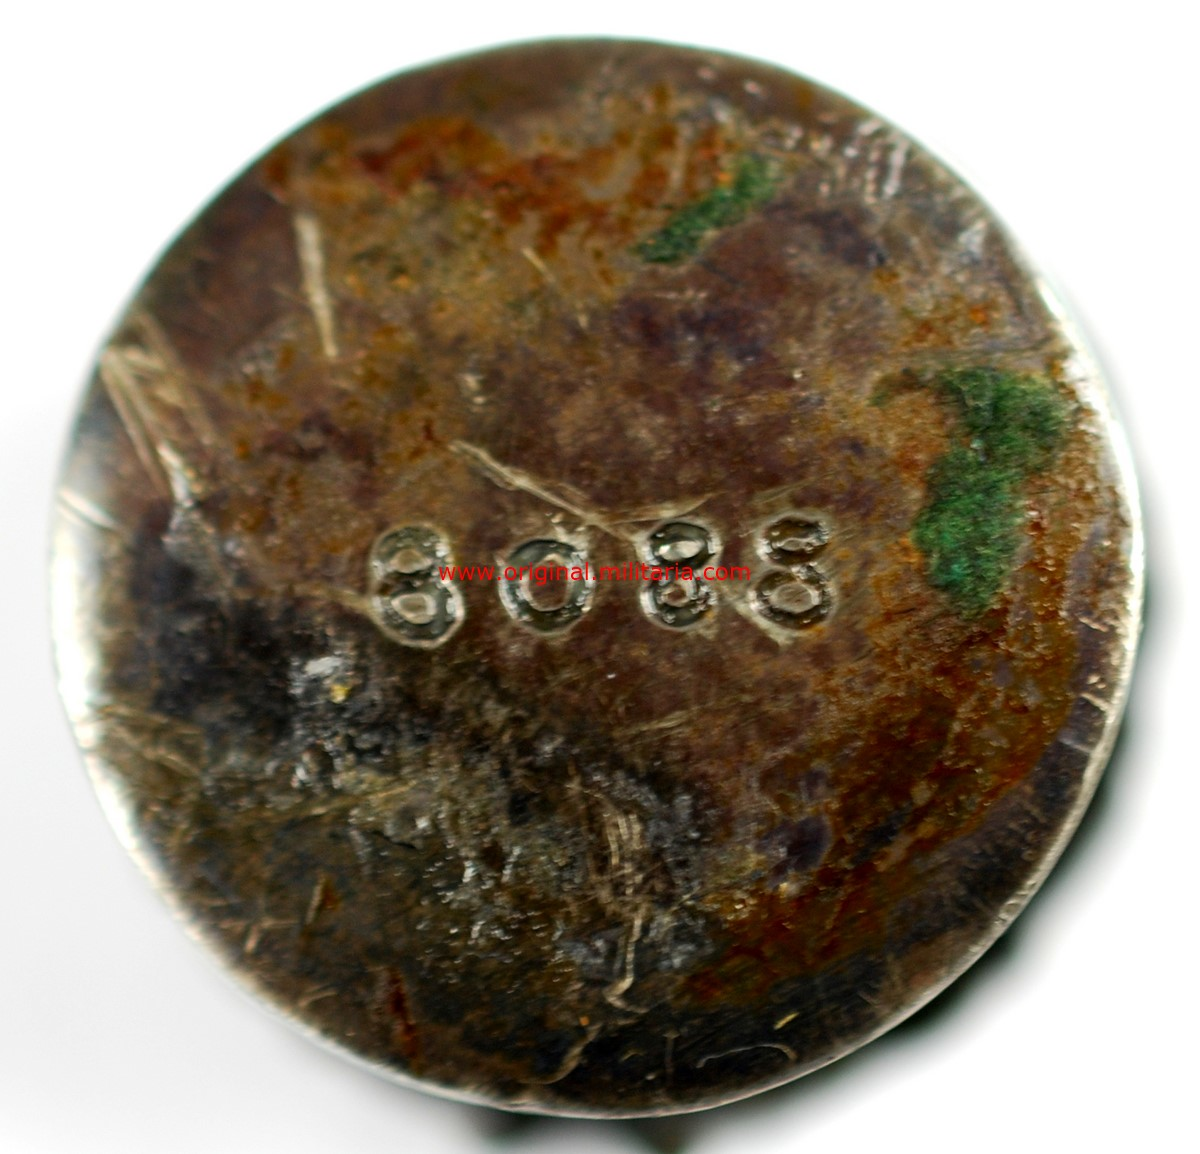 Miniatura de Ojal de la Medalla de la Vieja Guardia con Número 8088.